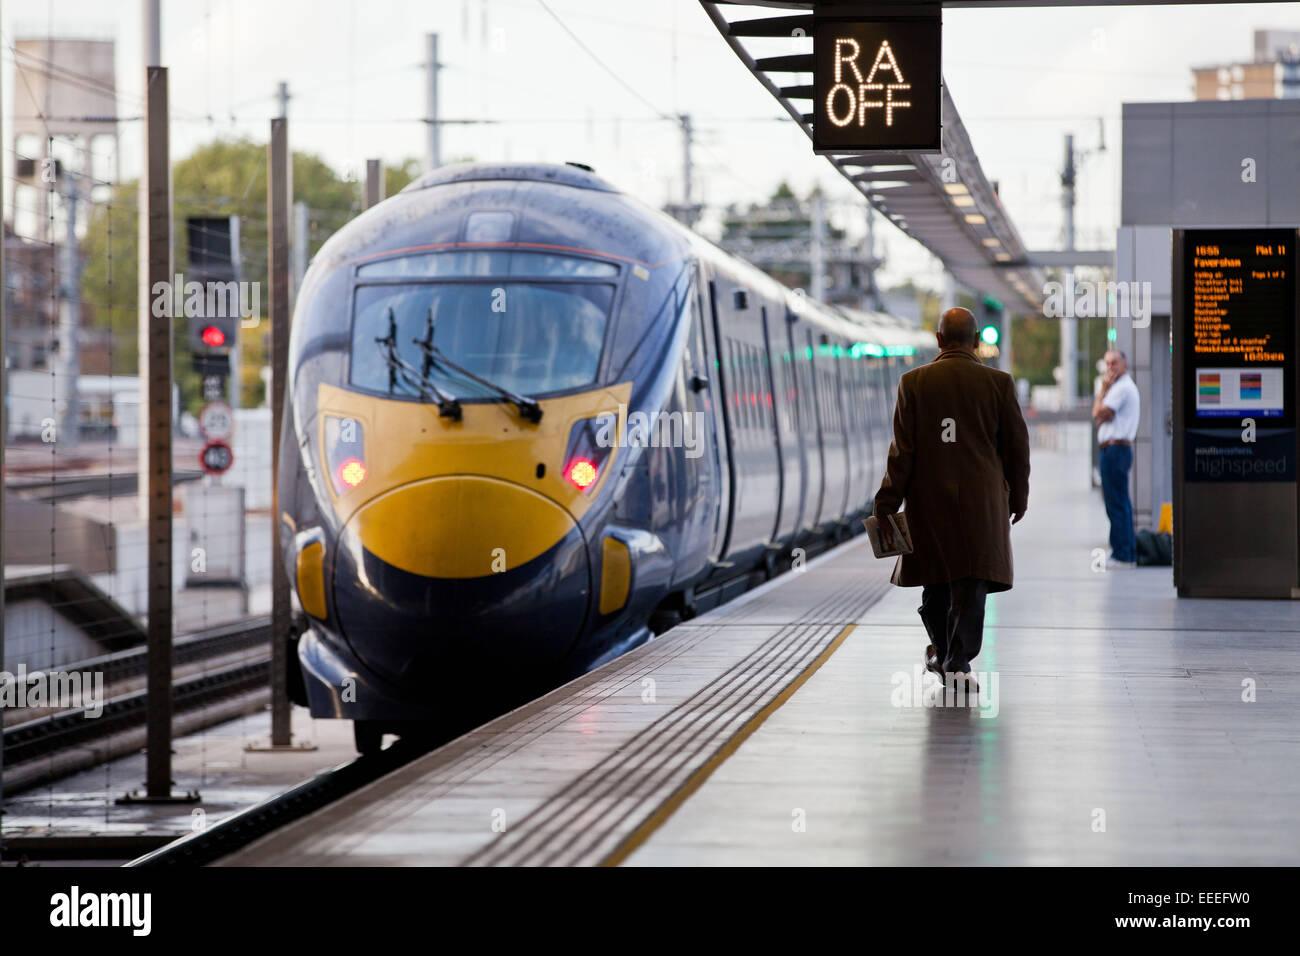 Clase 395 Sureste de tren de alta velocidad en la plataforma en St. Pancras International Imagen De Stock